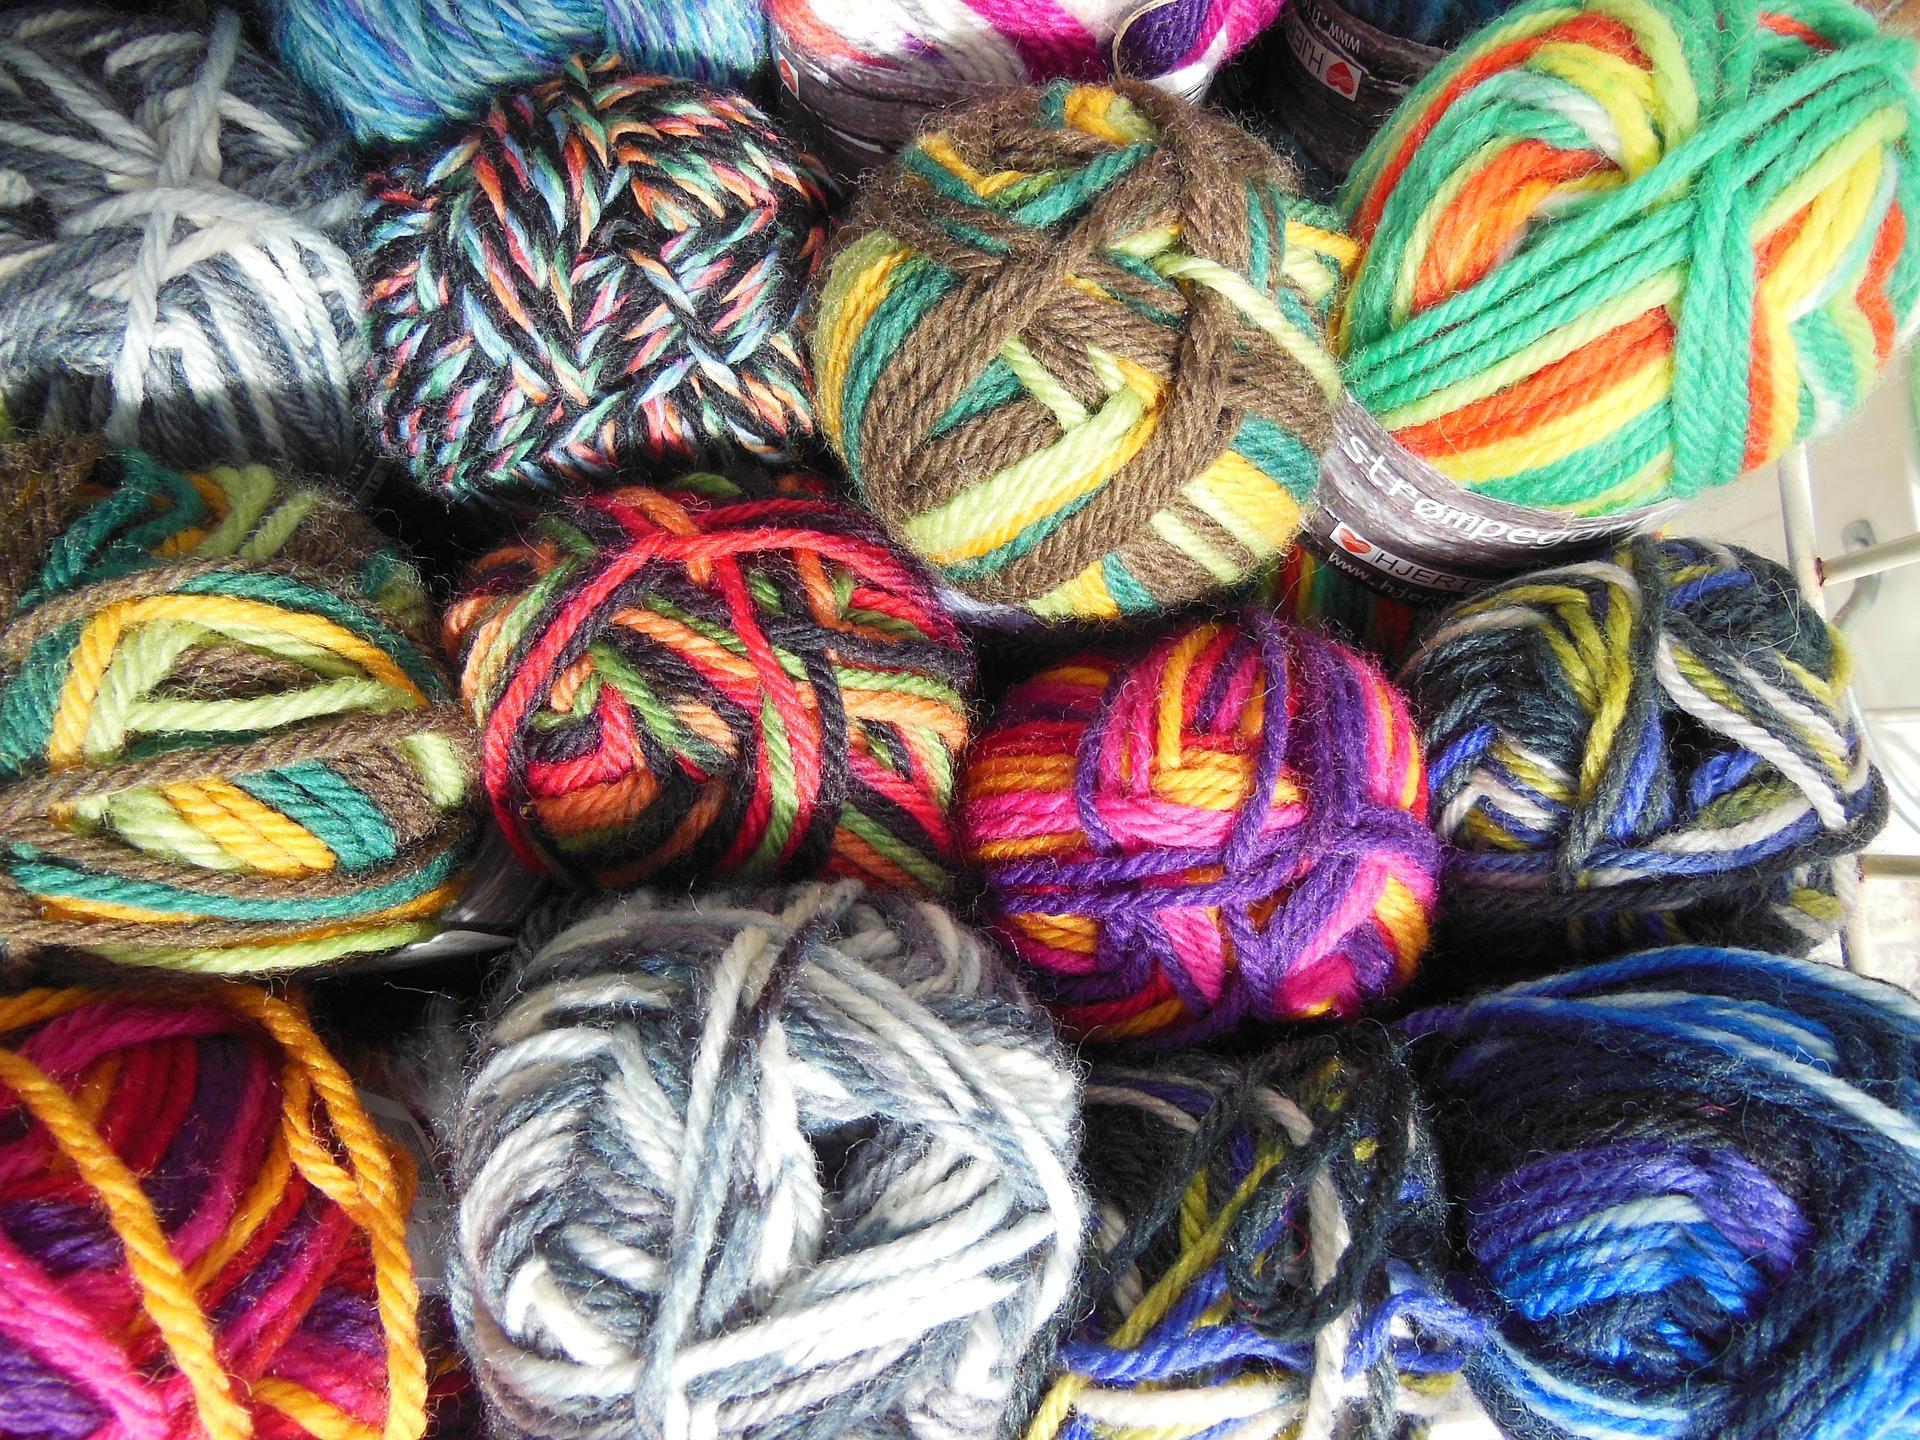 yarn-100947_1920